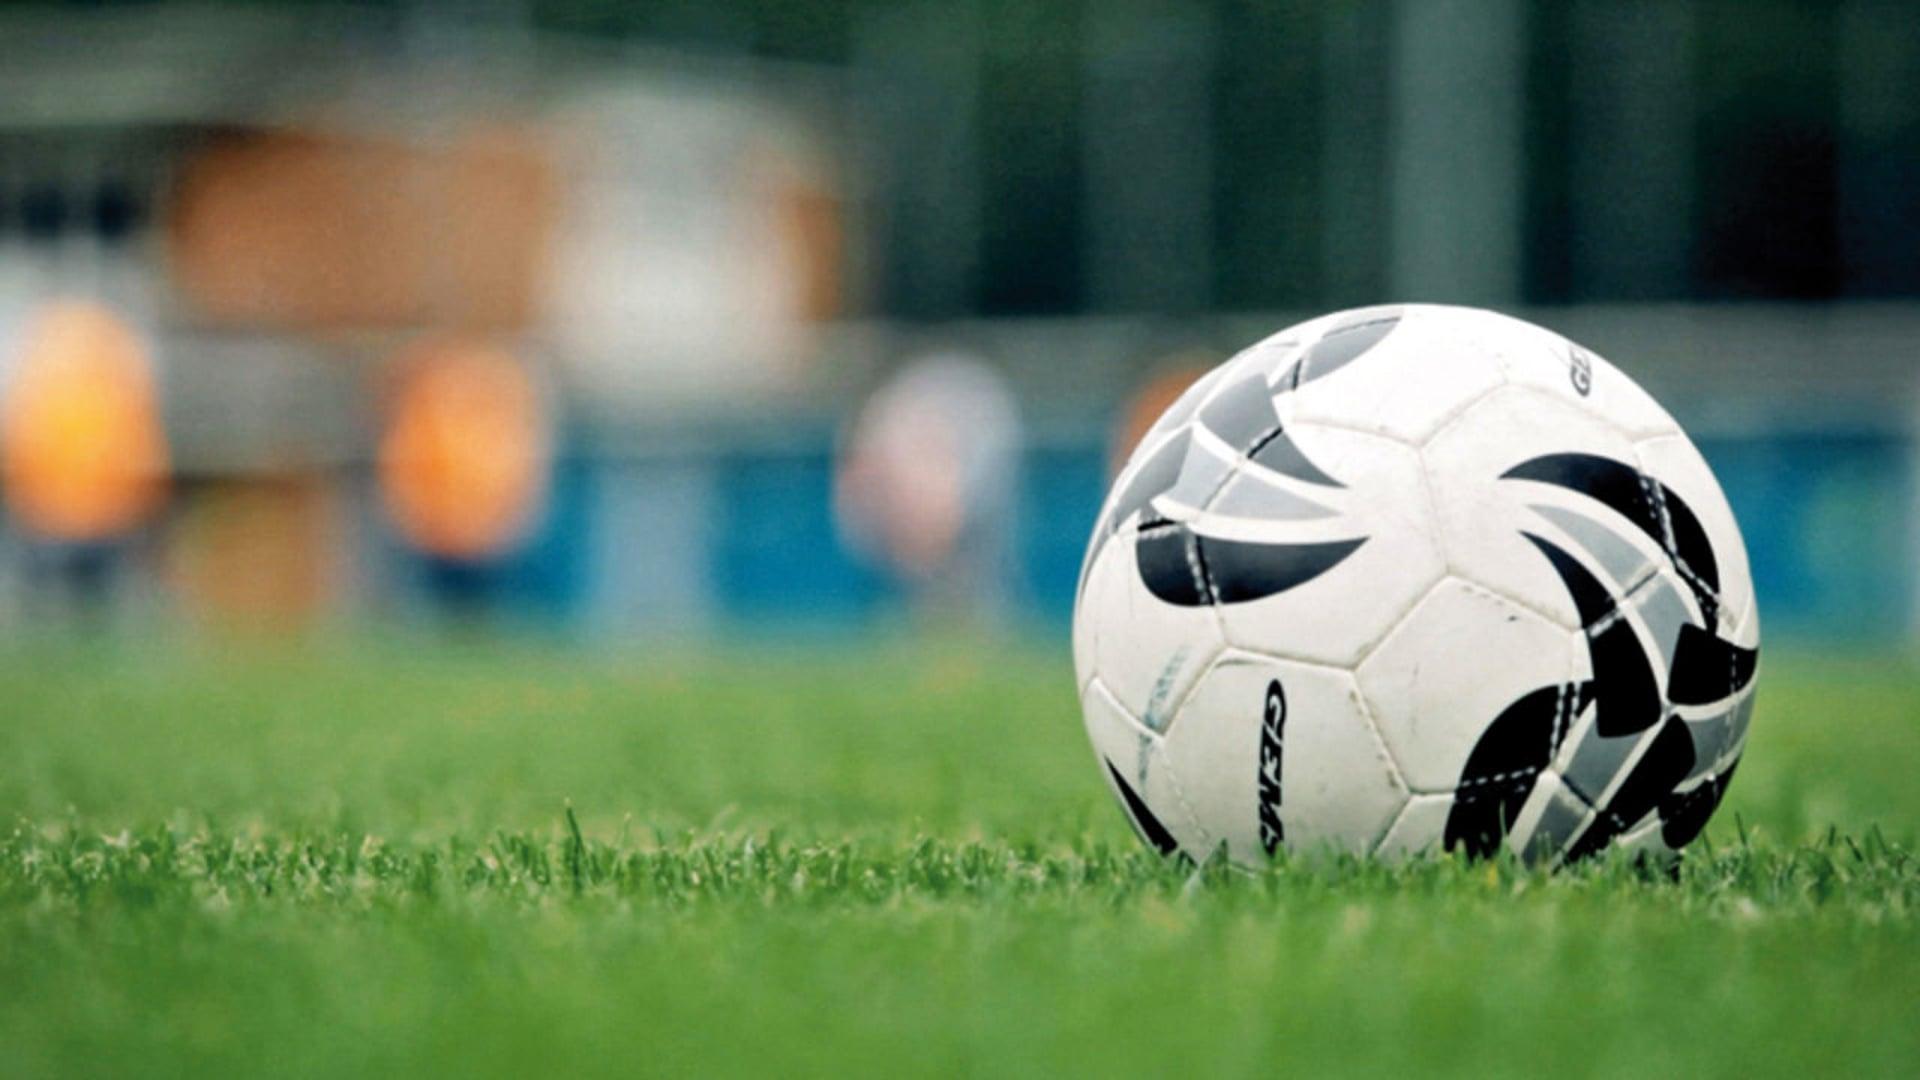 Football's dreamteam